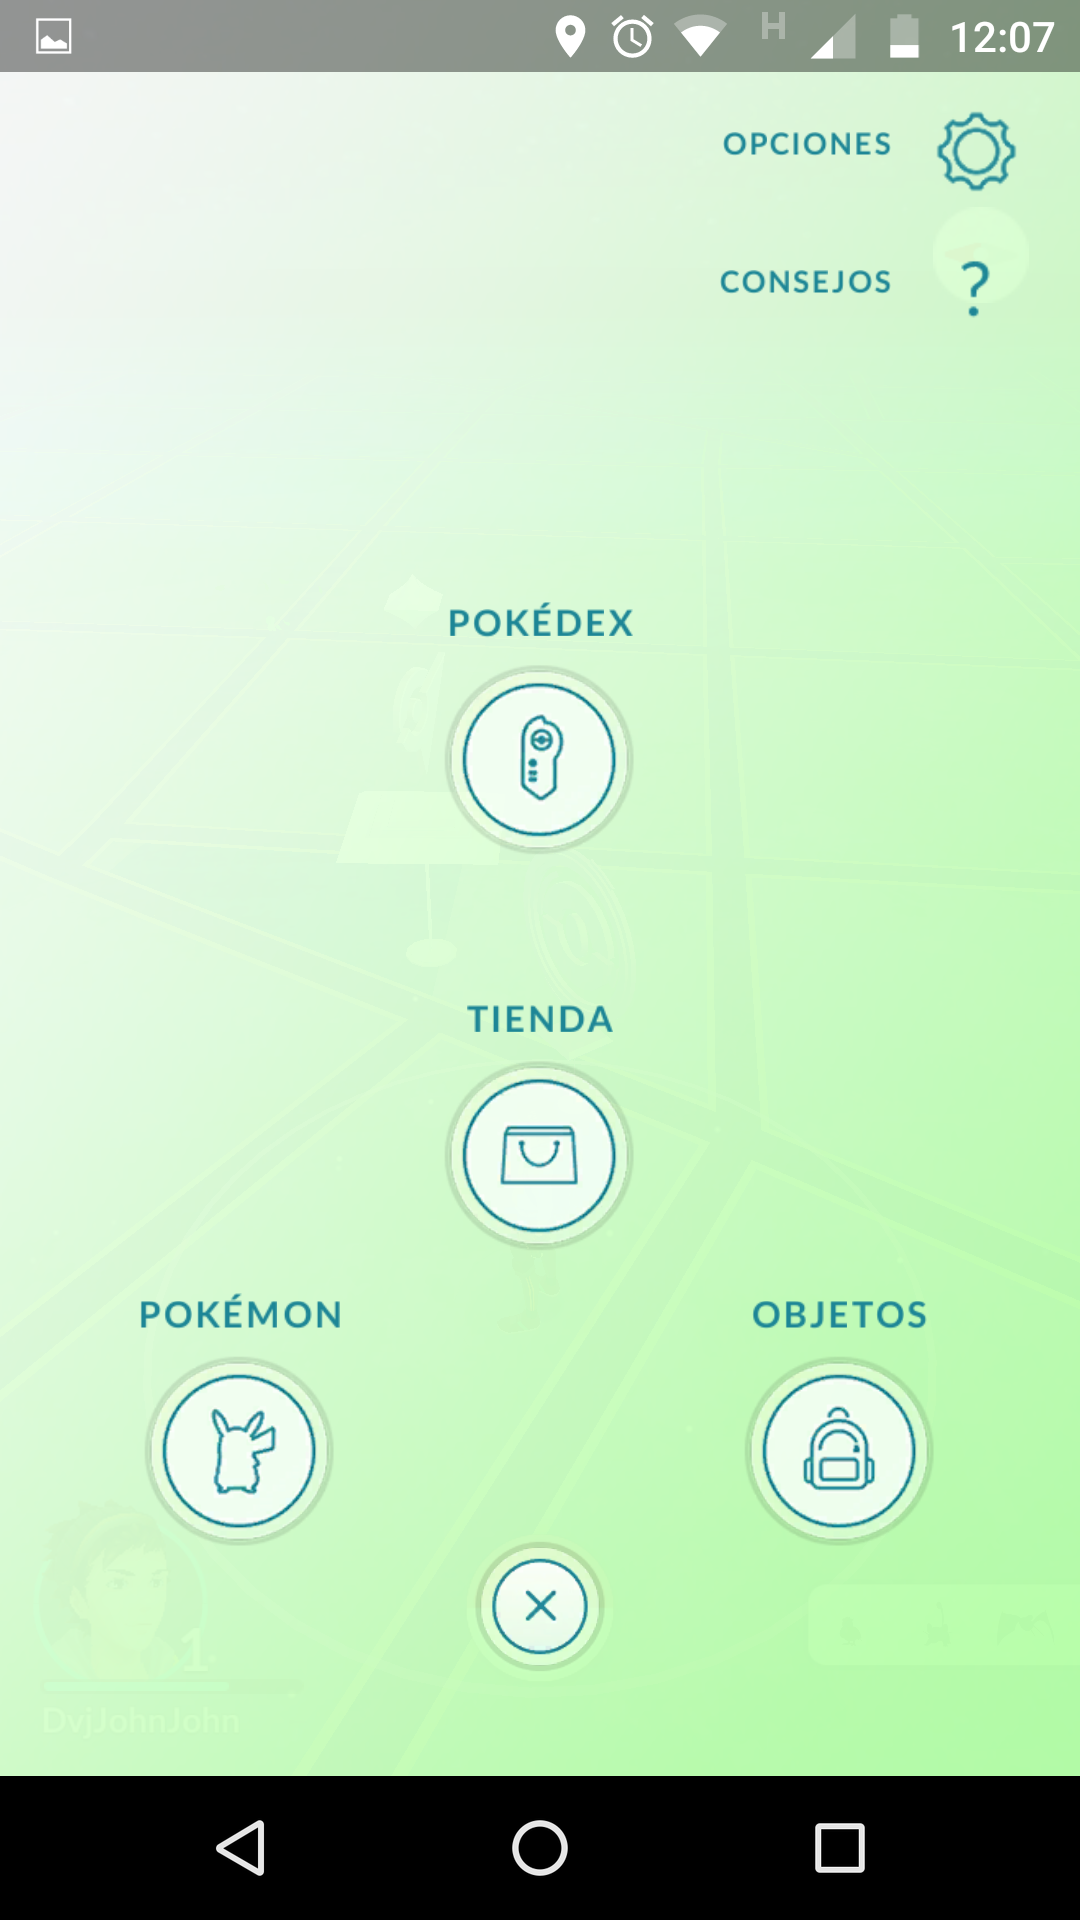 Descarga Pokemon Go disponible Android Mexico Latam (8)